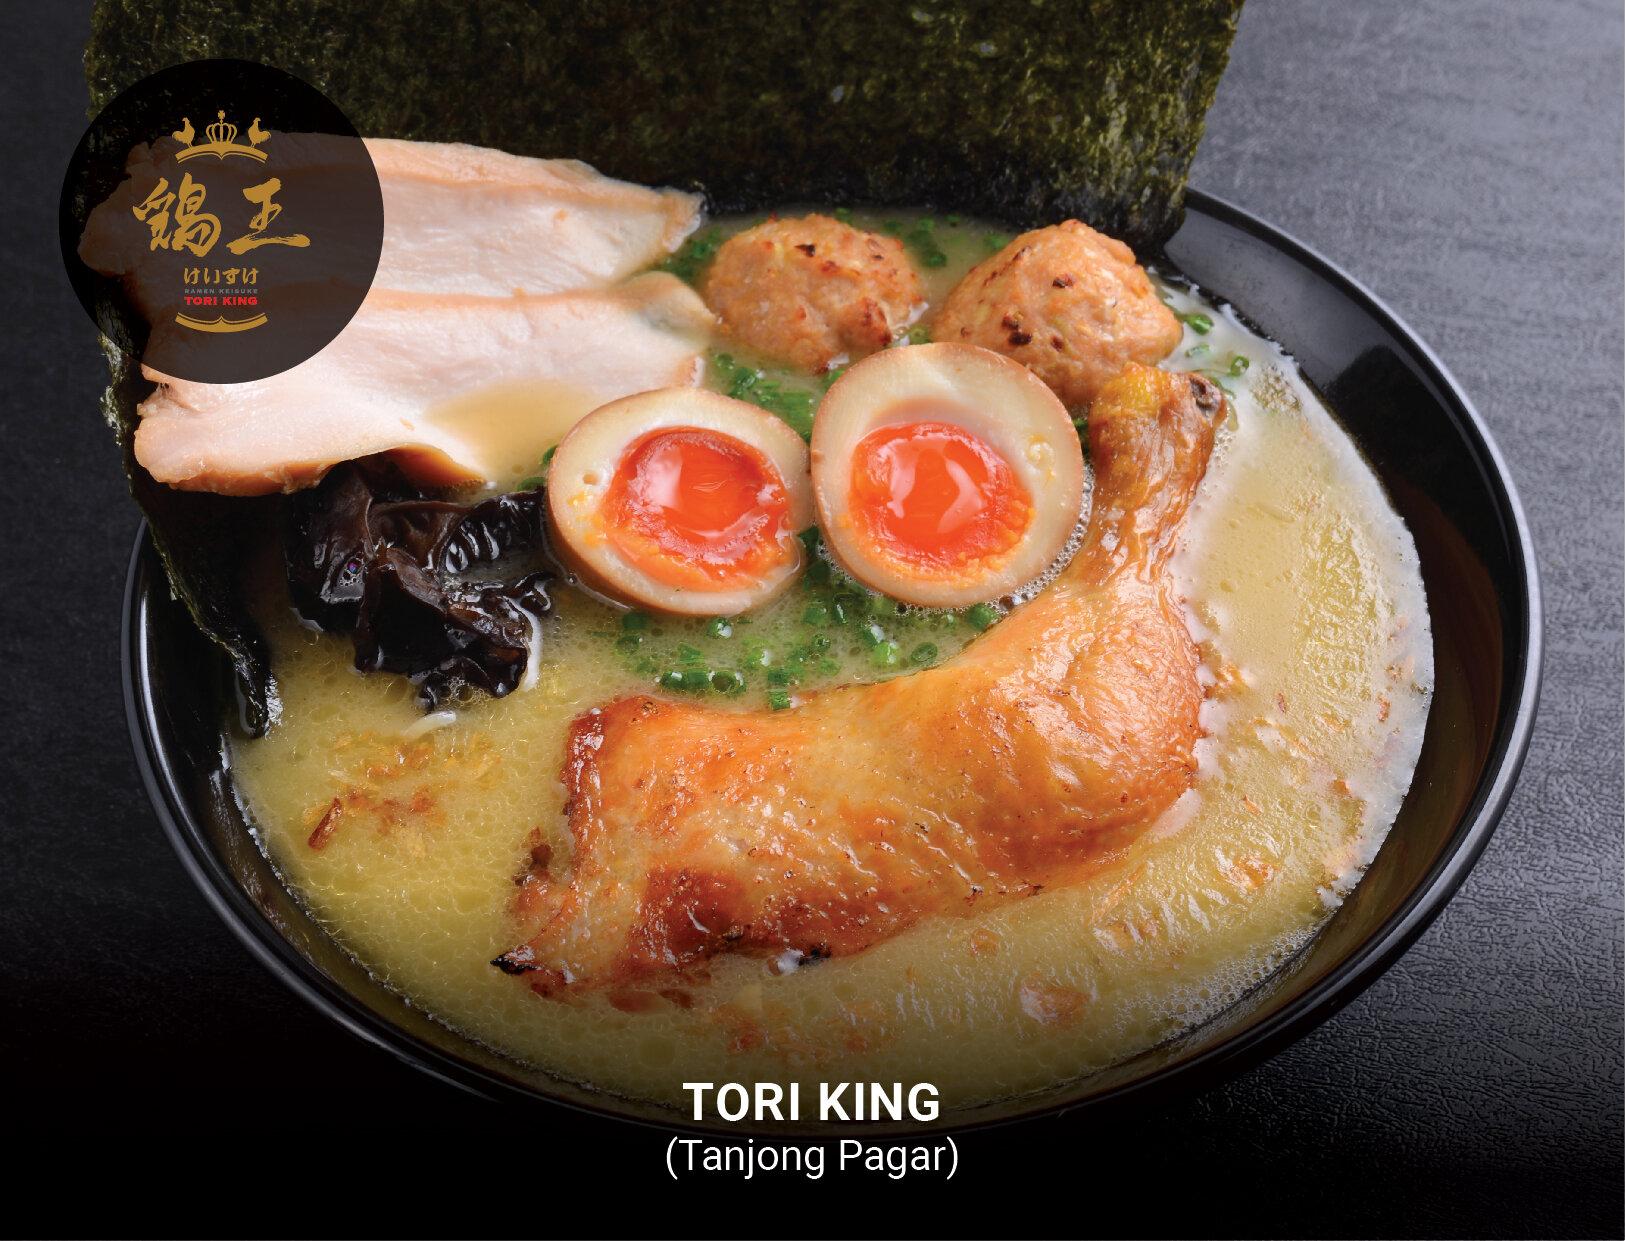 Tori King (Tanjong Pagar)